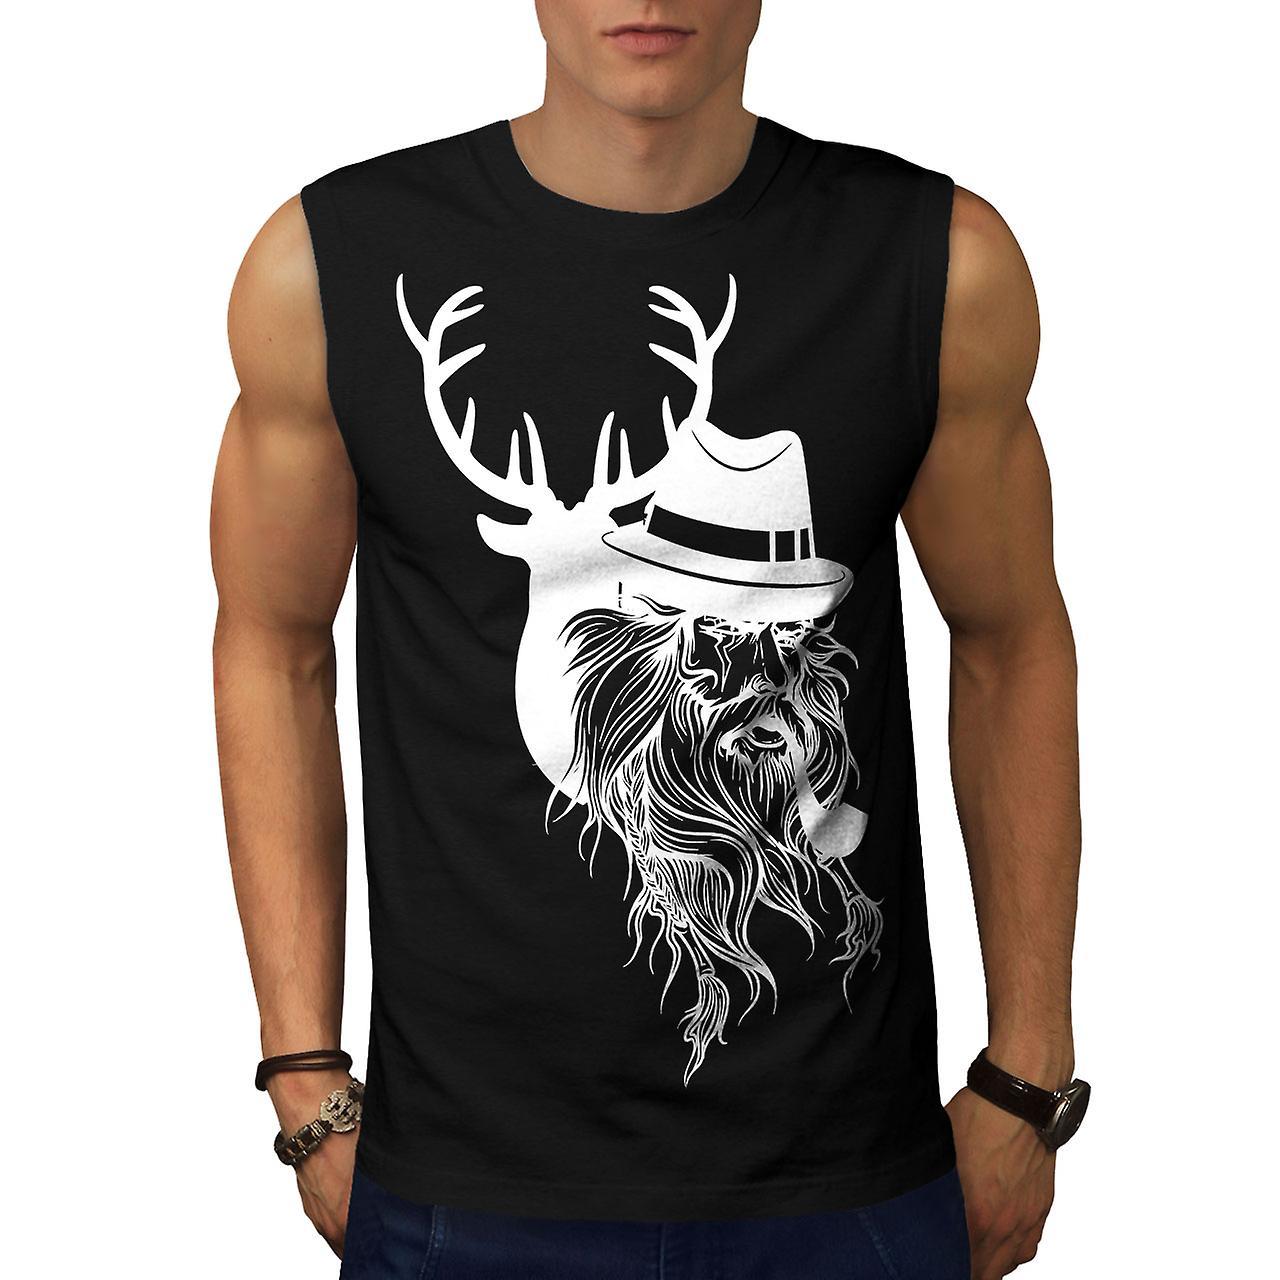 deer human wild fantasy men black sleeveless t shirt wellcoda fruugo. Black Bedroom Furniture Sets. Home Design Ideas